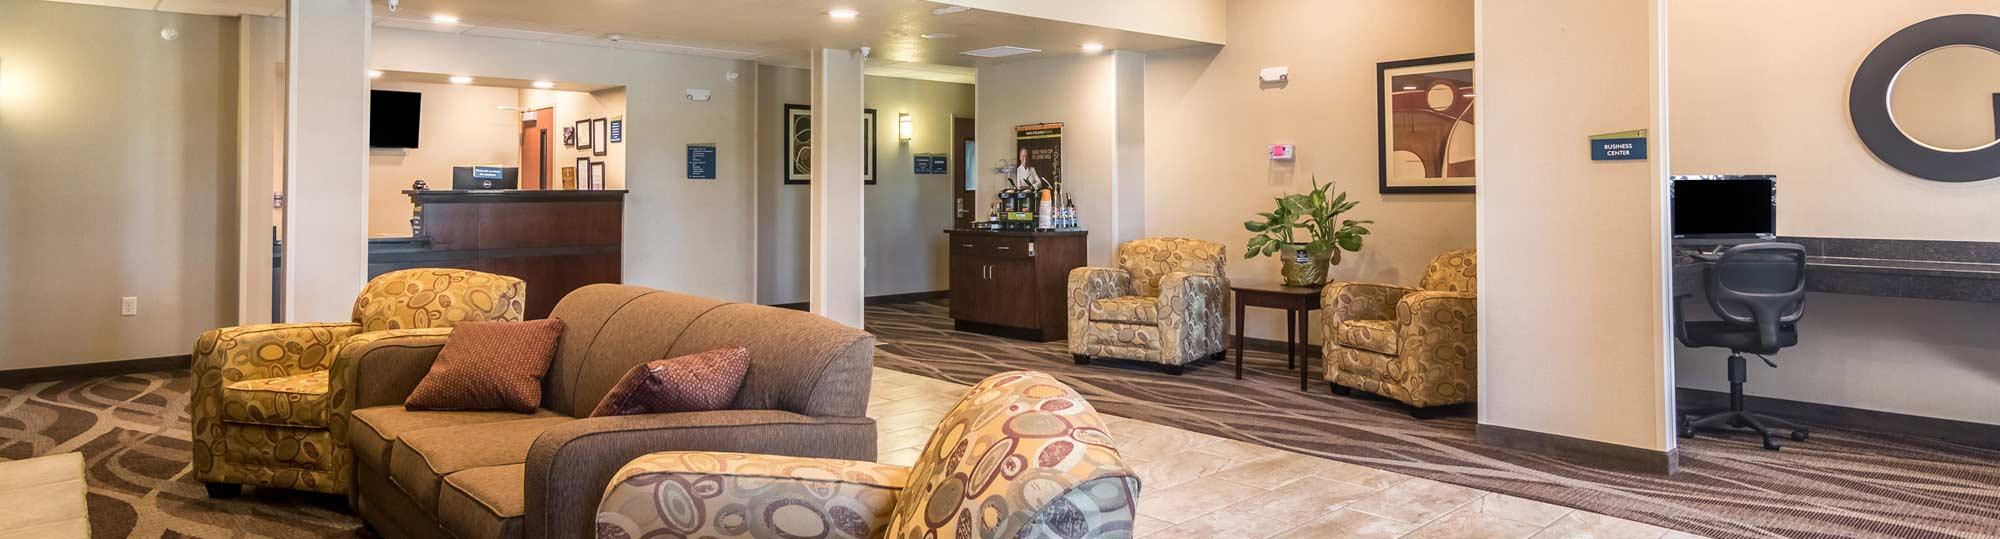 Cobblestone Inn and Suites Lakin